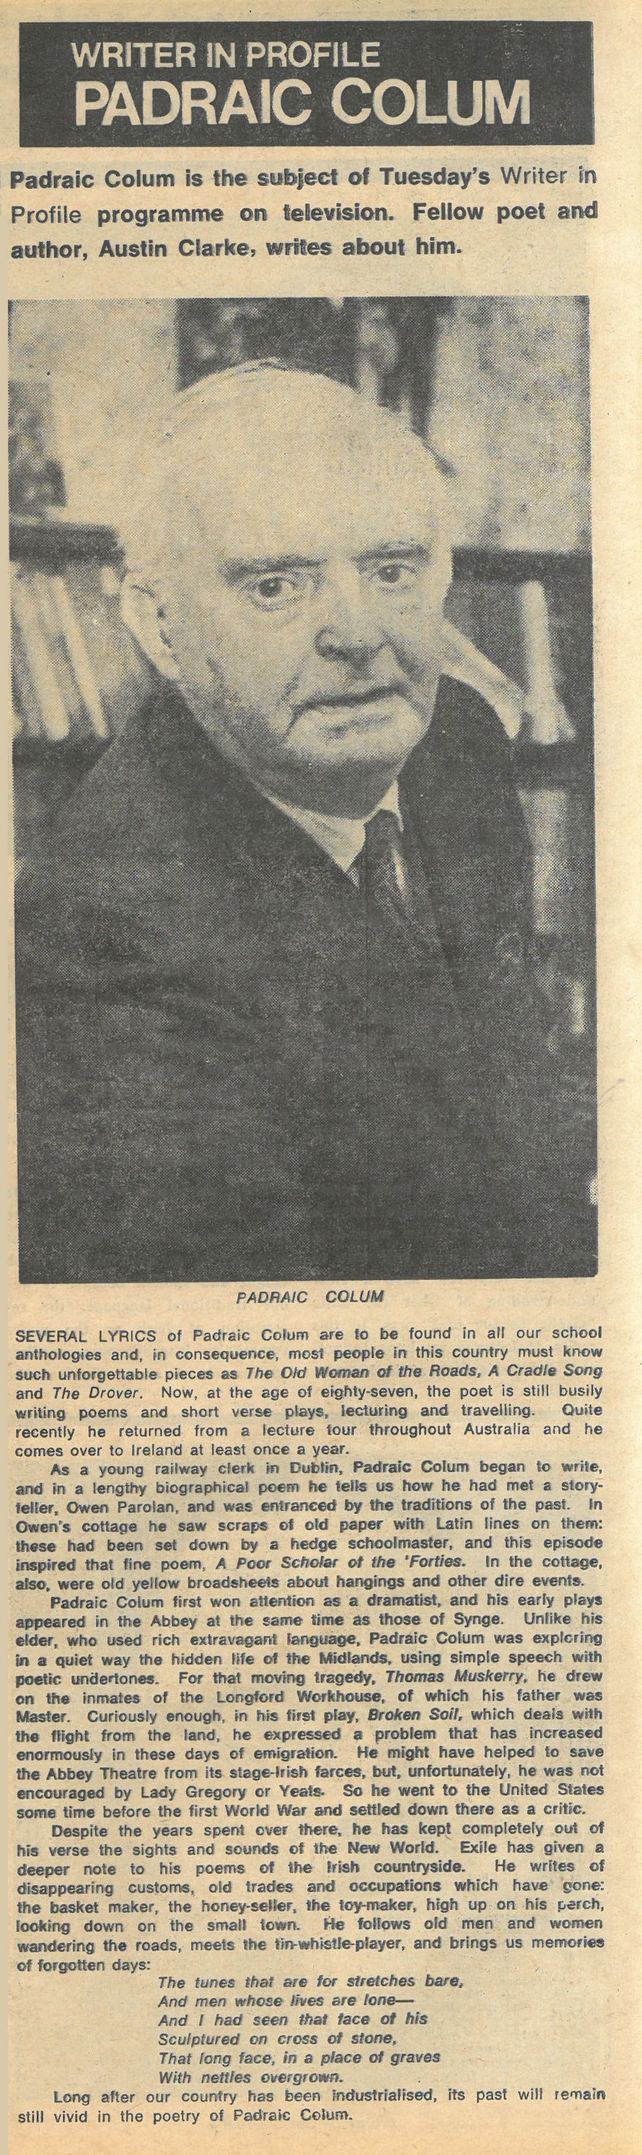 Padraic Colum RTÉ Guide (1968)